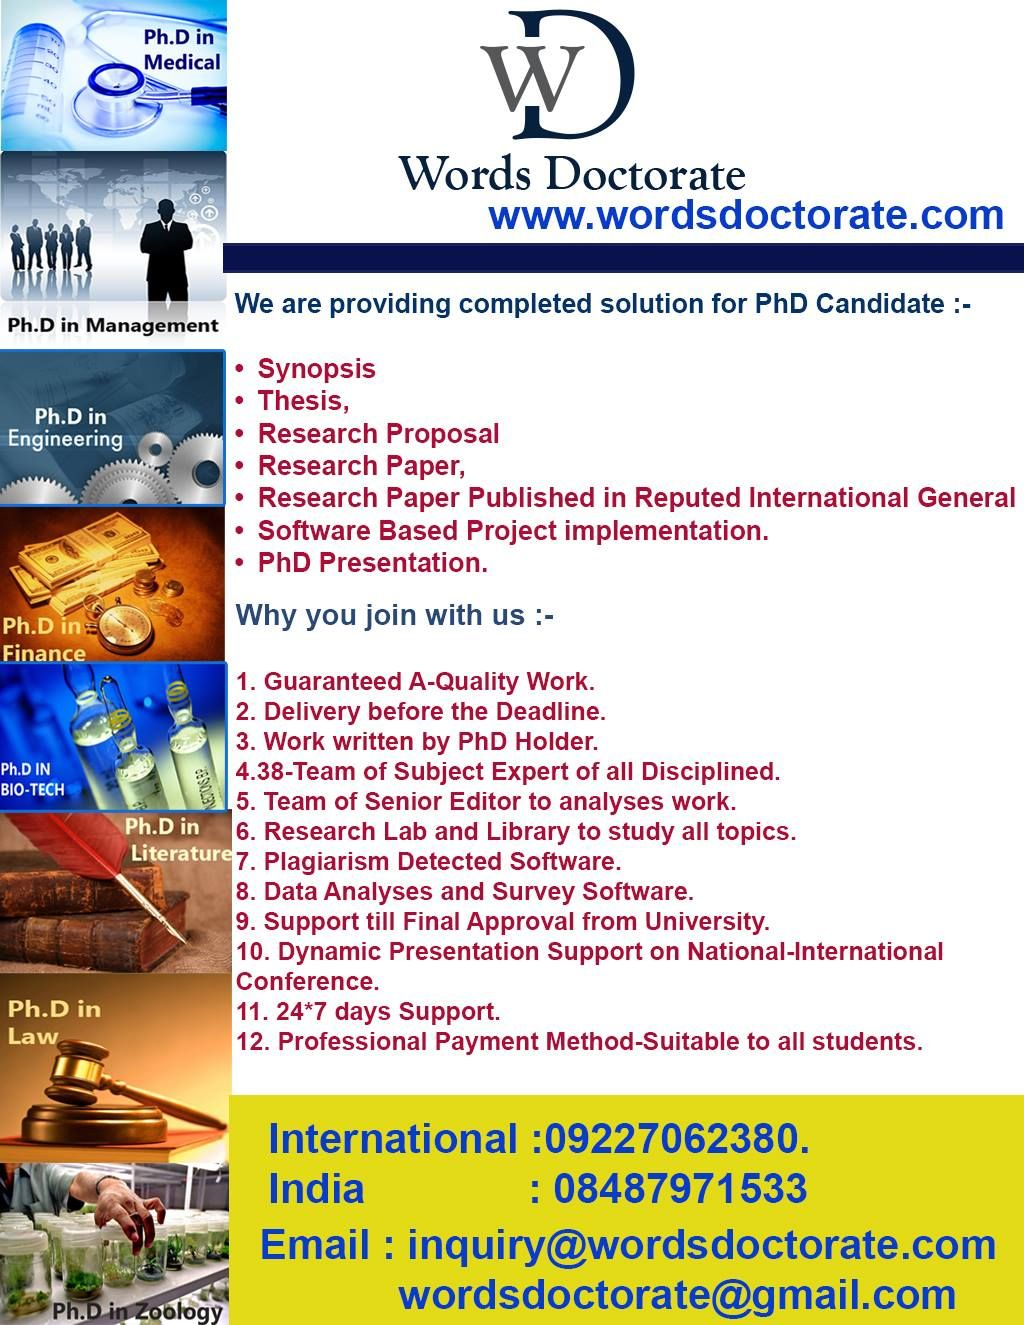 Proposal writing companies in india